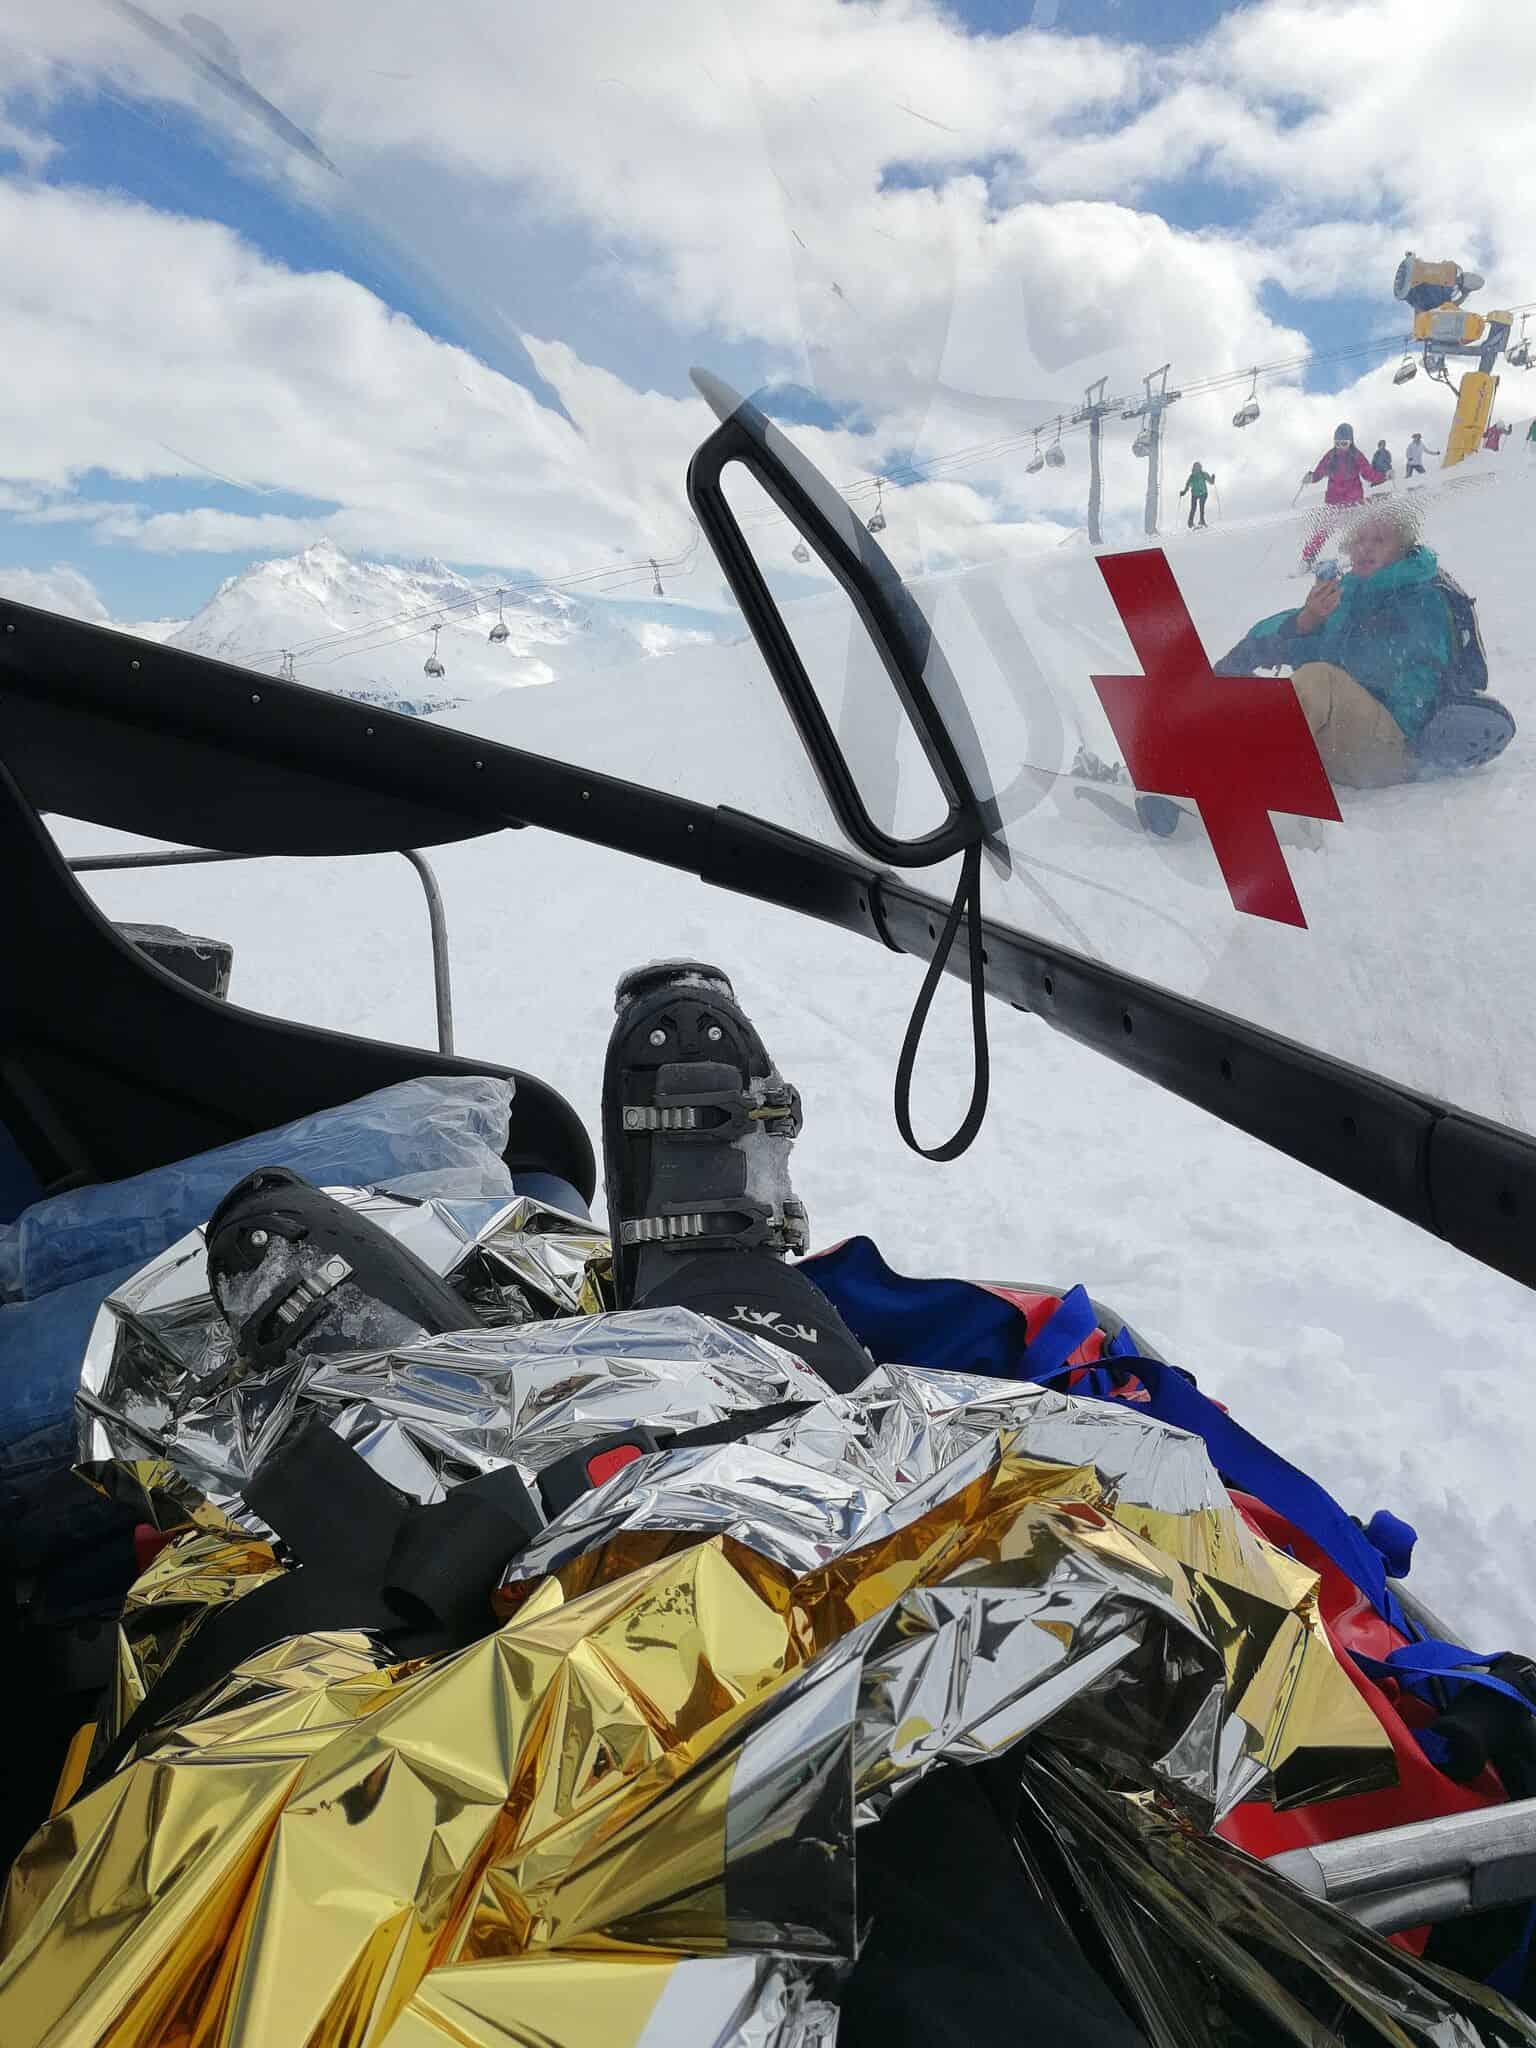 Diary week 11:  hoe ik met loeiende sirenes van de ski piste afgehaald werd..